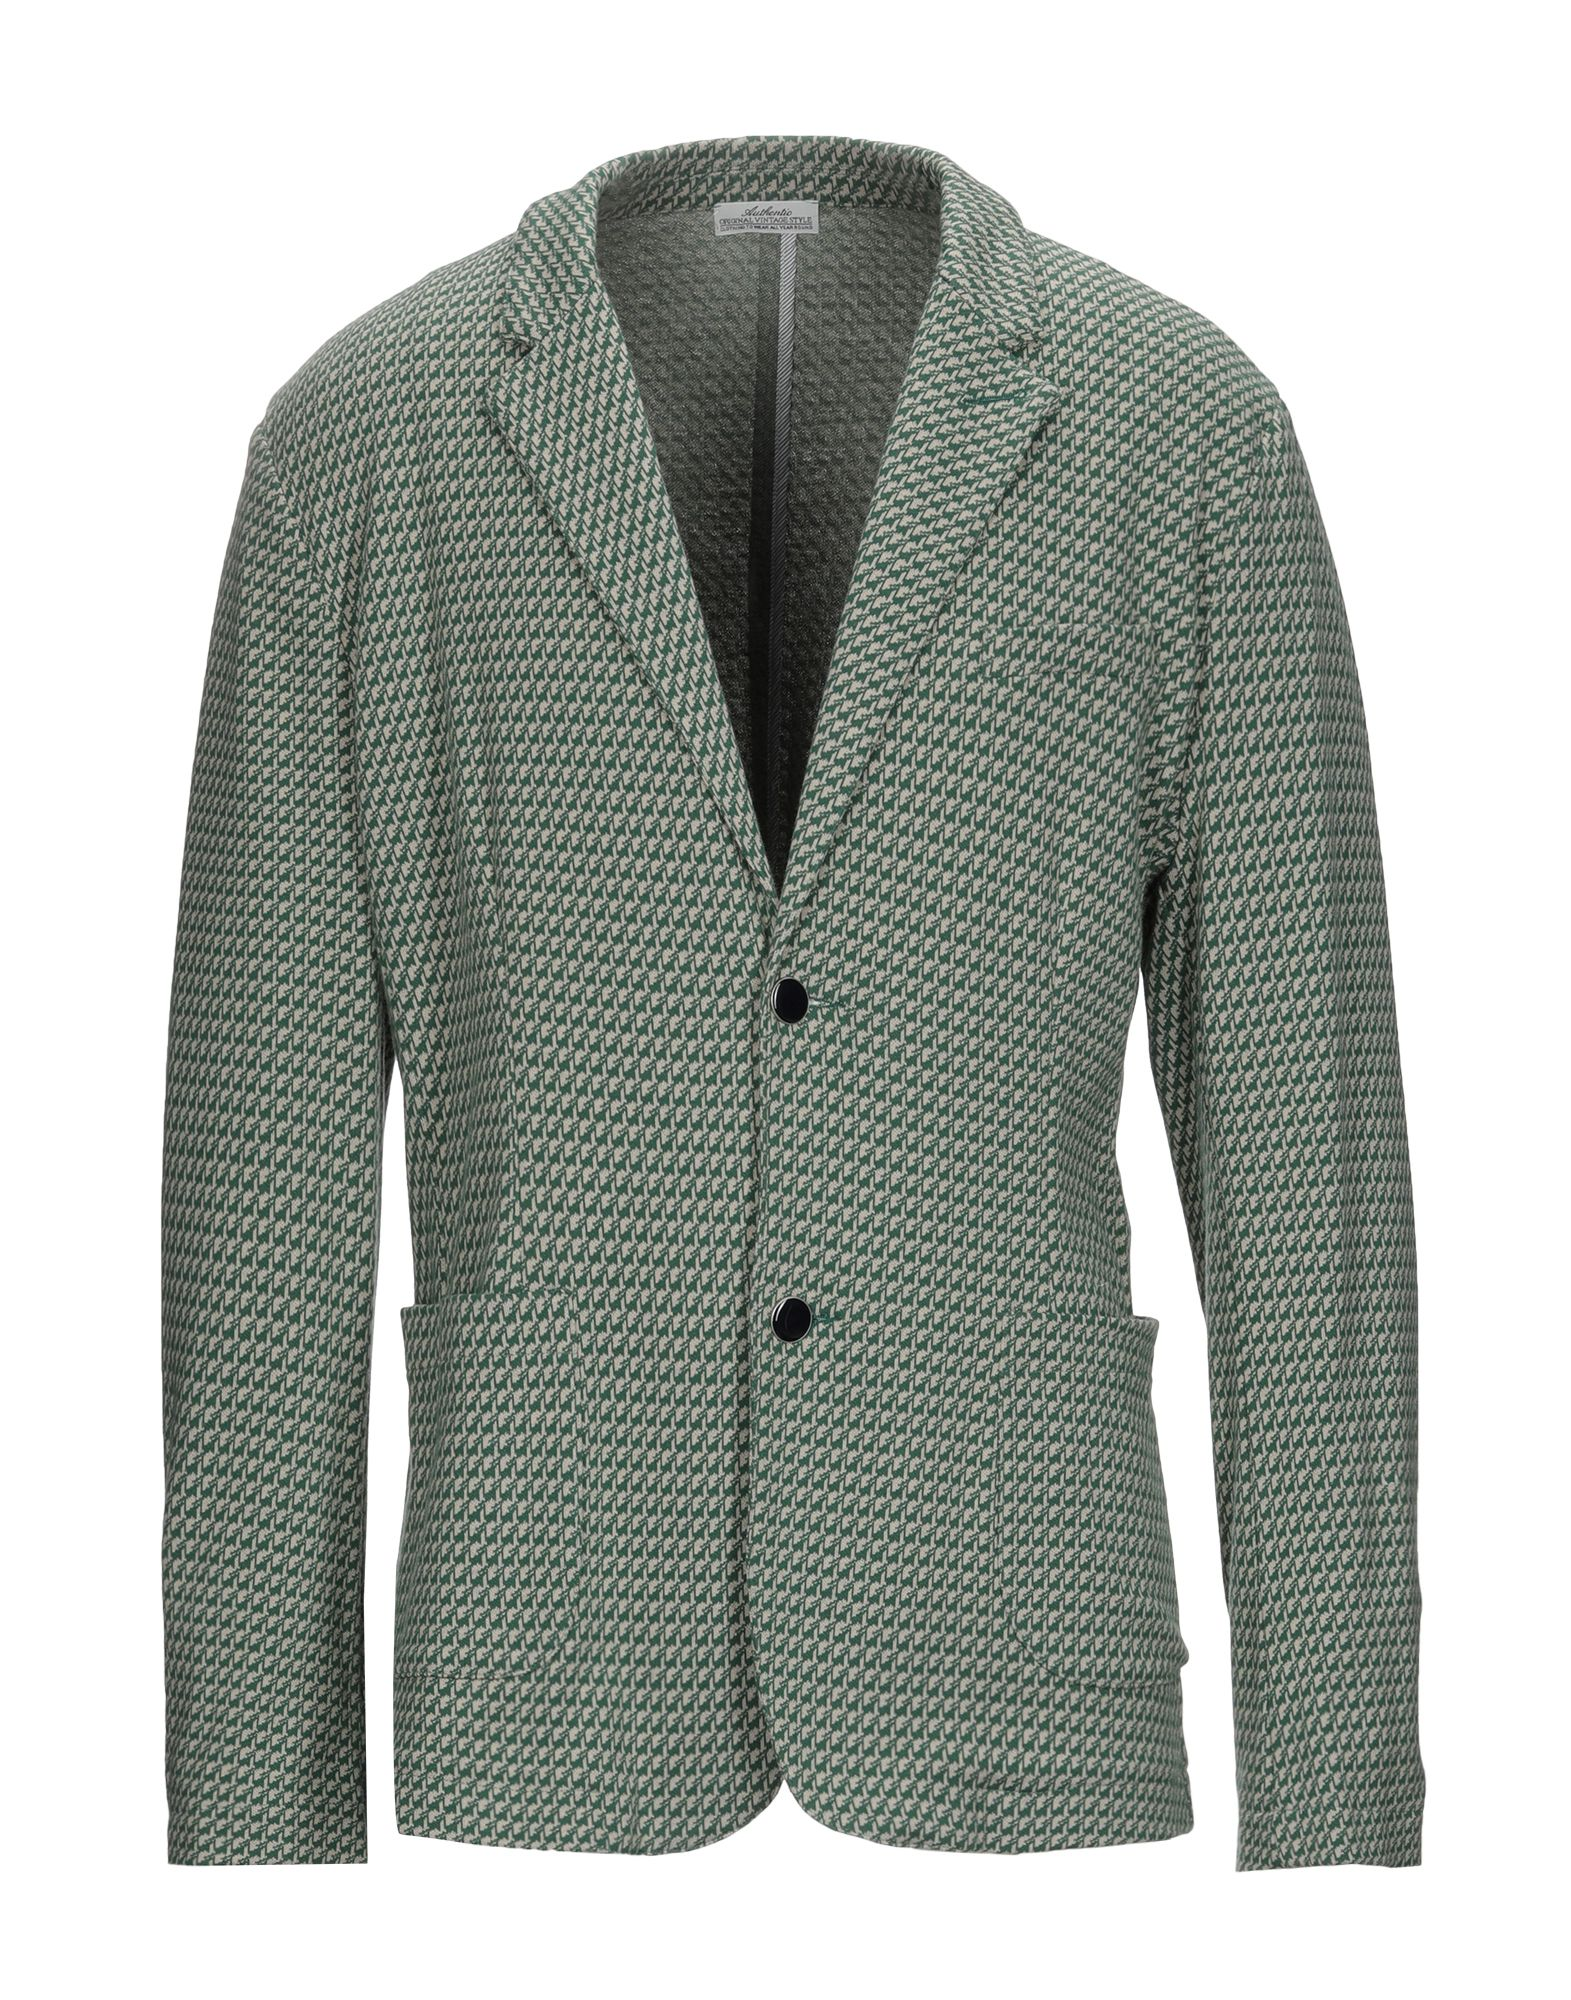 Giacca Authentic Original Vintage Style Uomo - Acquista online su